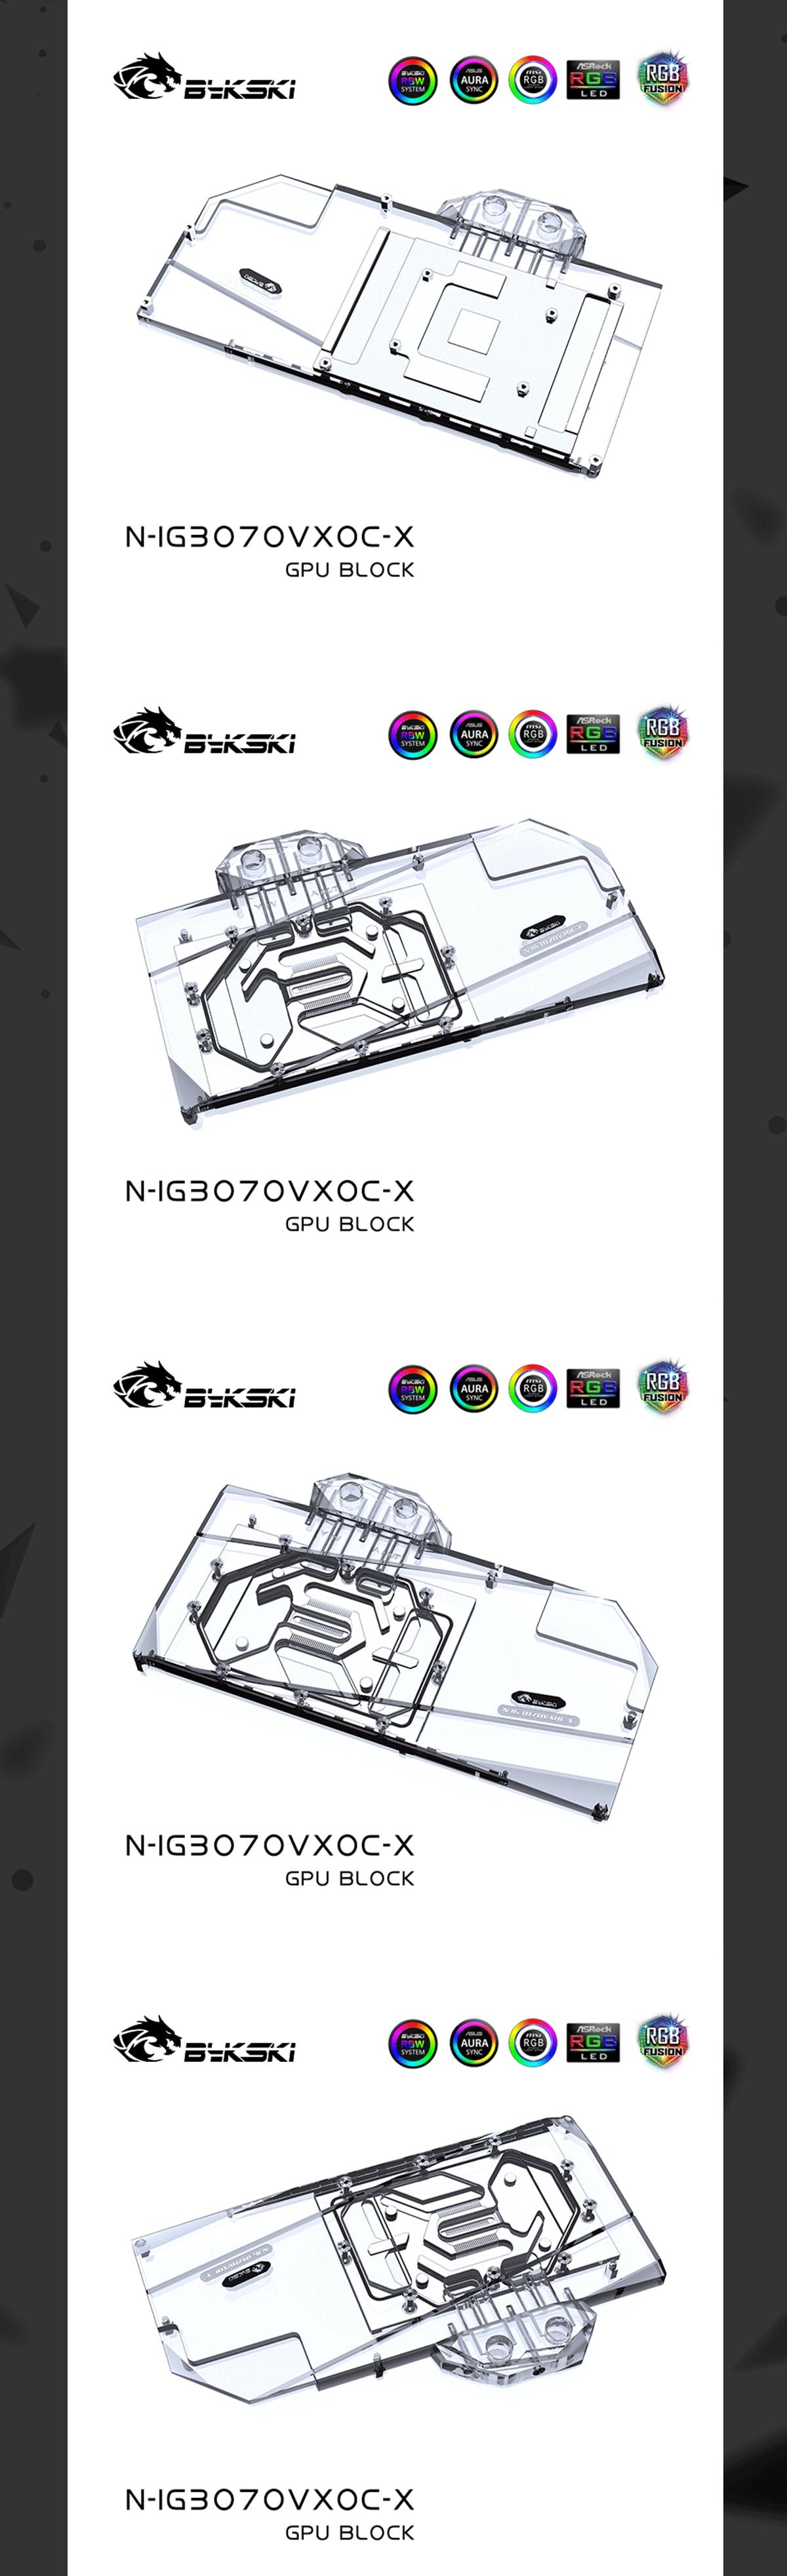 Bykski GPU Water Block N-IG3070VXOC-X , For Colorful RTX 3060TI /3070 Ti Vulcan Neptune GPU Card , Radiator Water Cooling Liquid